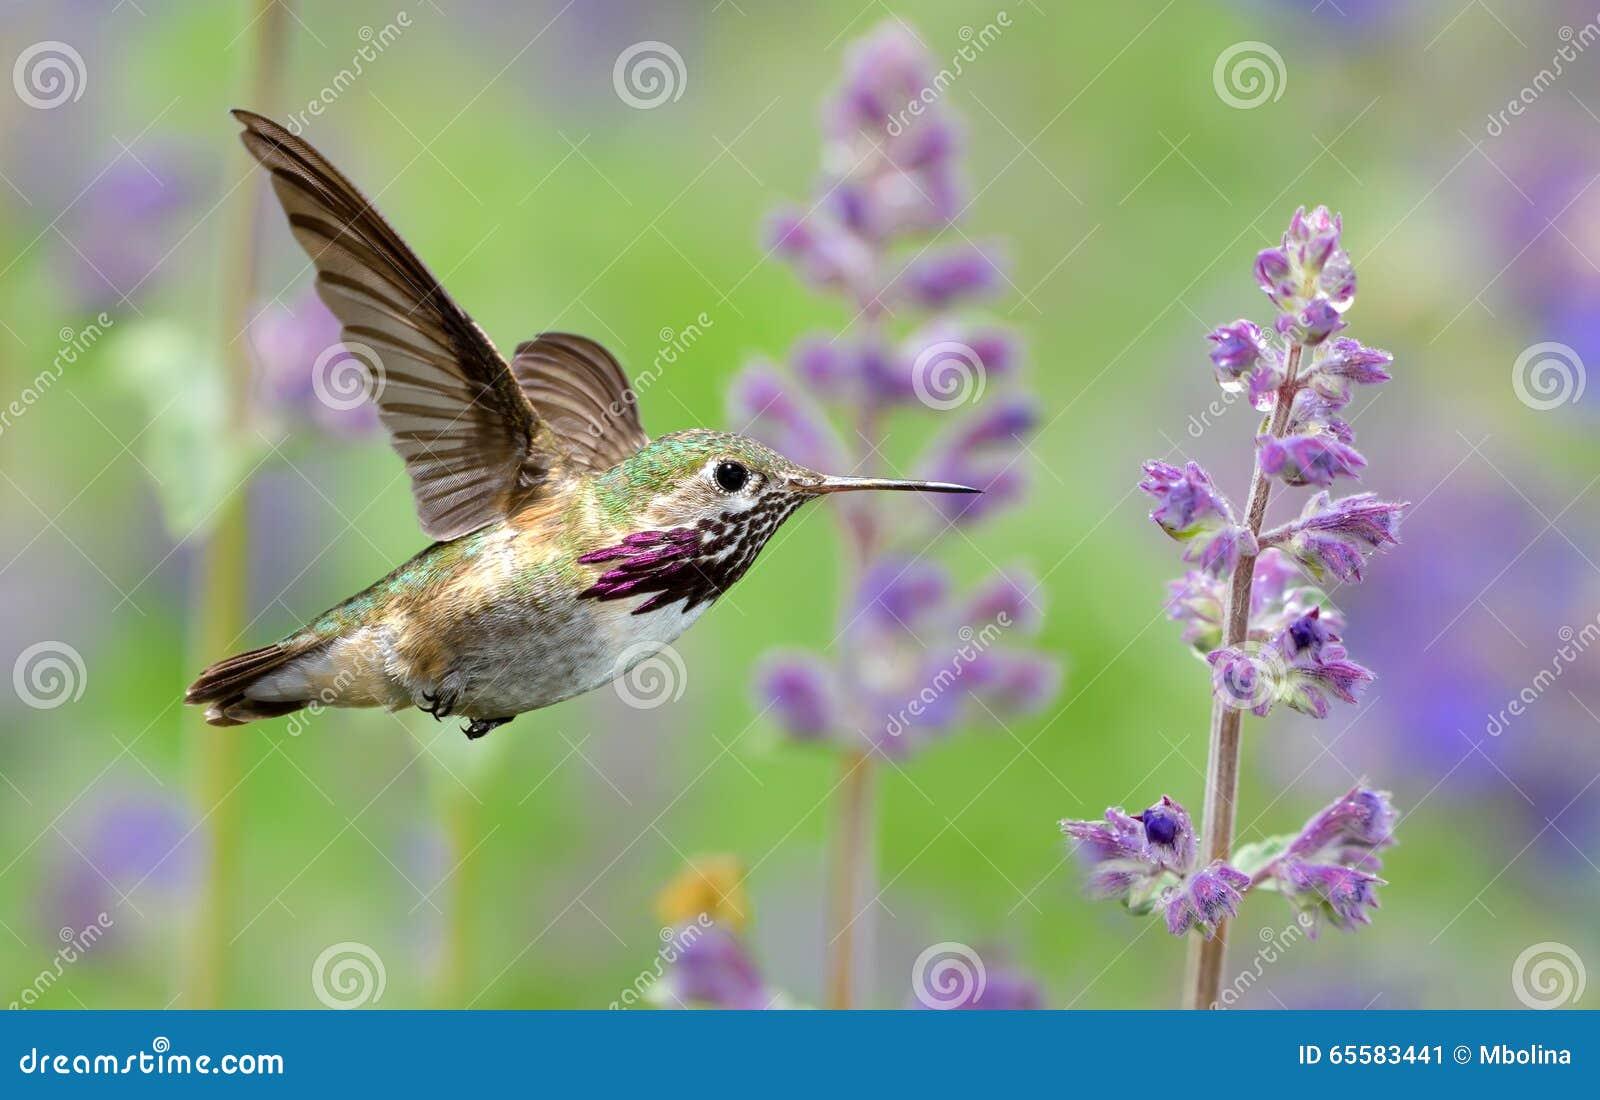 Lujoso Lavanda Uñas De Color Púrpura Motivo - Ideas Para Pintar Uñas ...